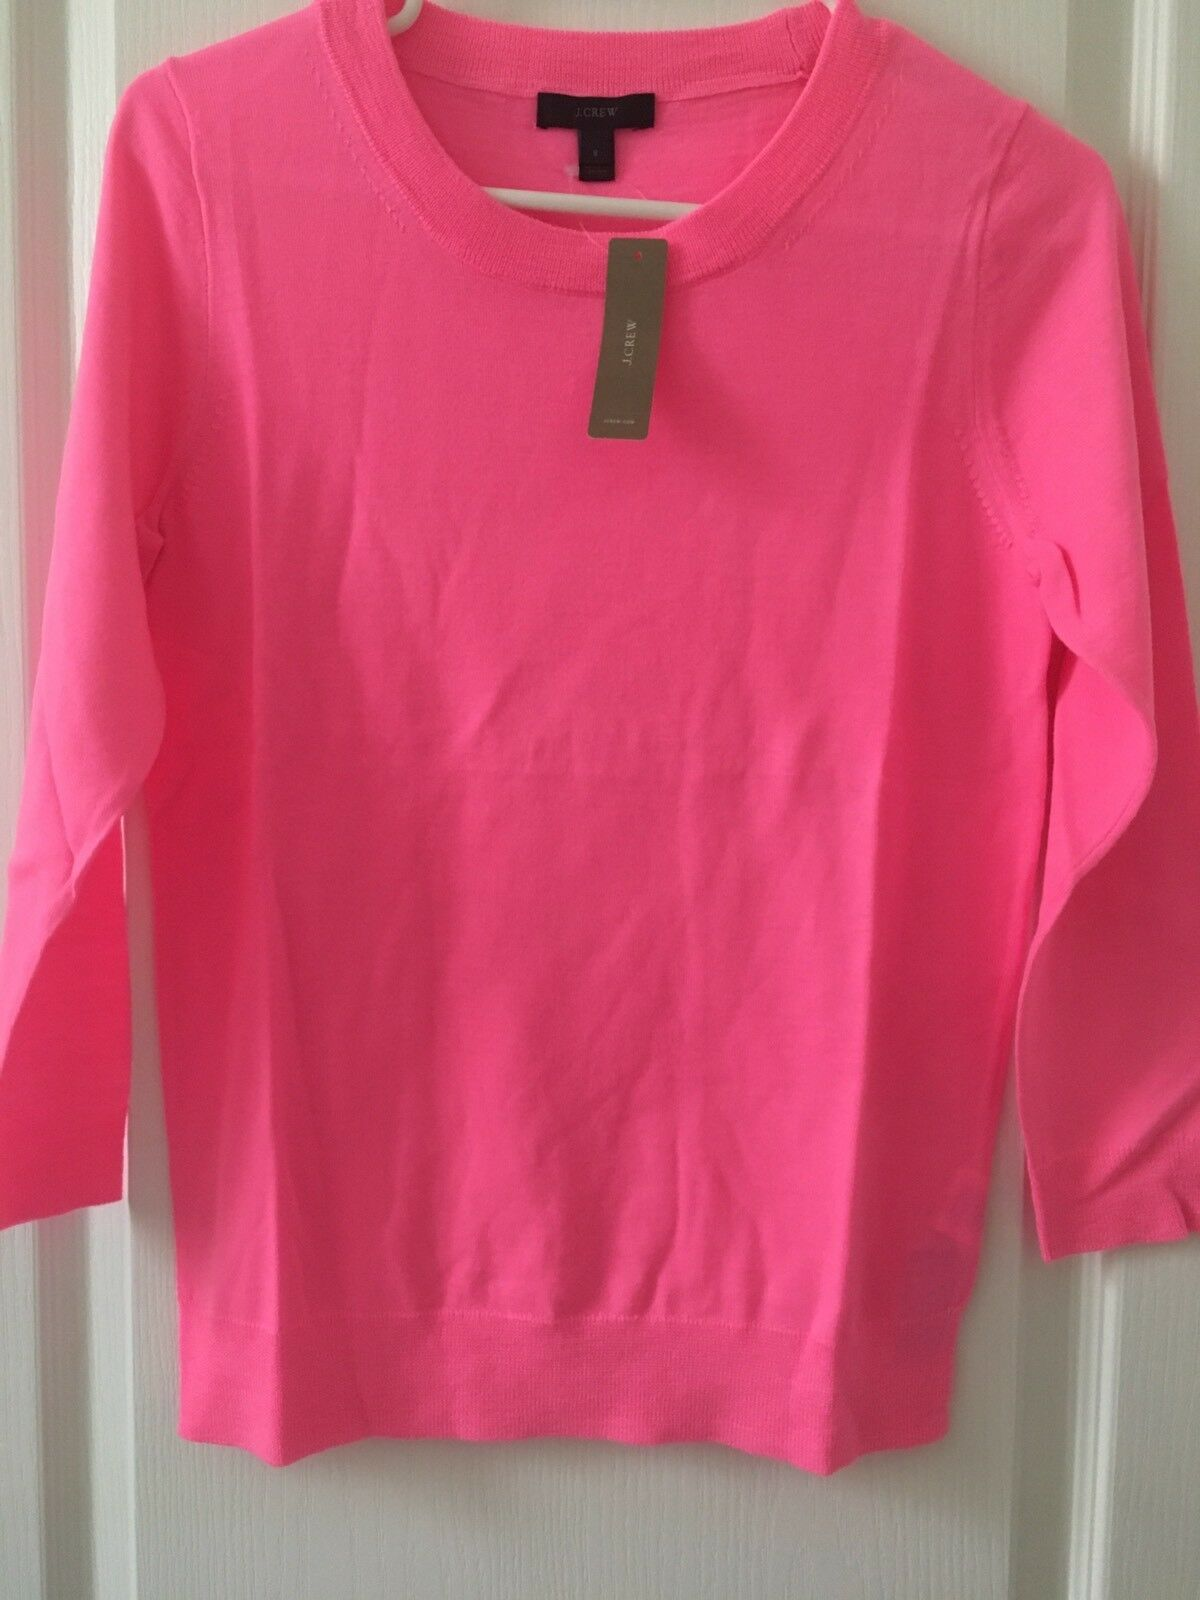 NWT JCrew Tippi Merino Wool Sweater Neon Geranium Pink S